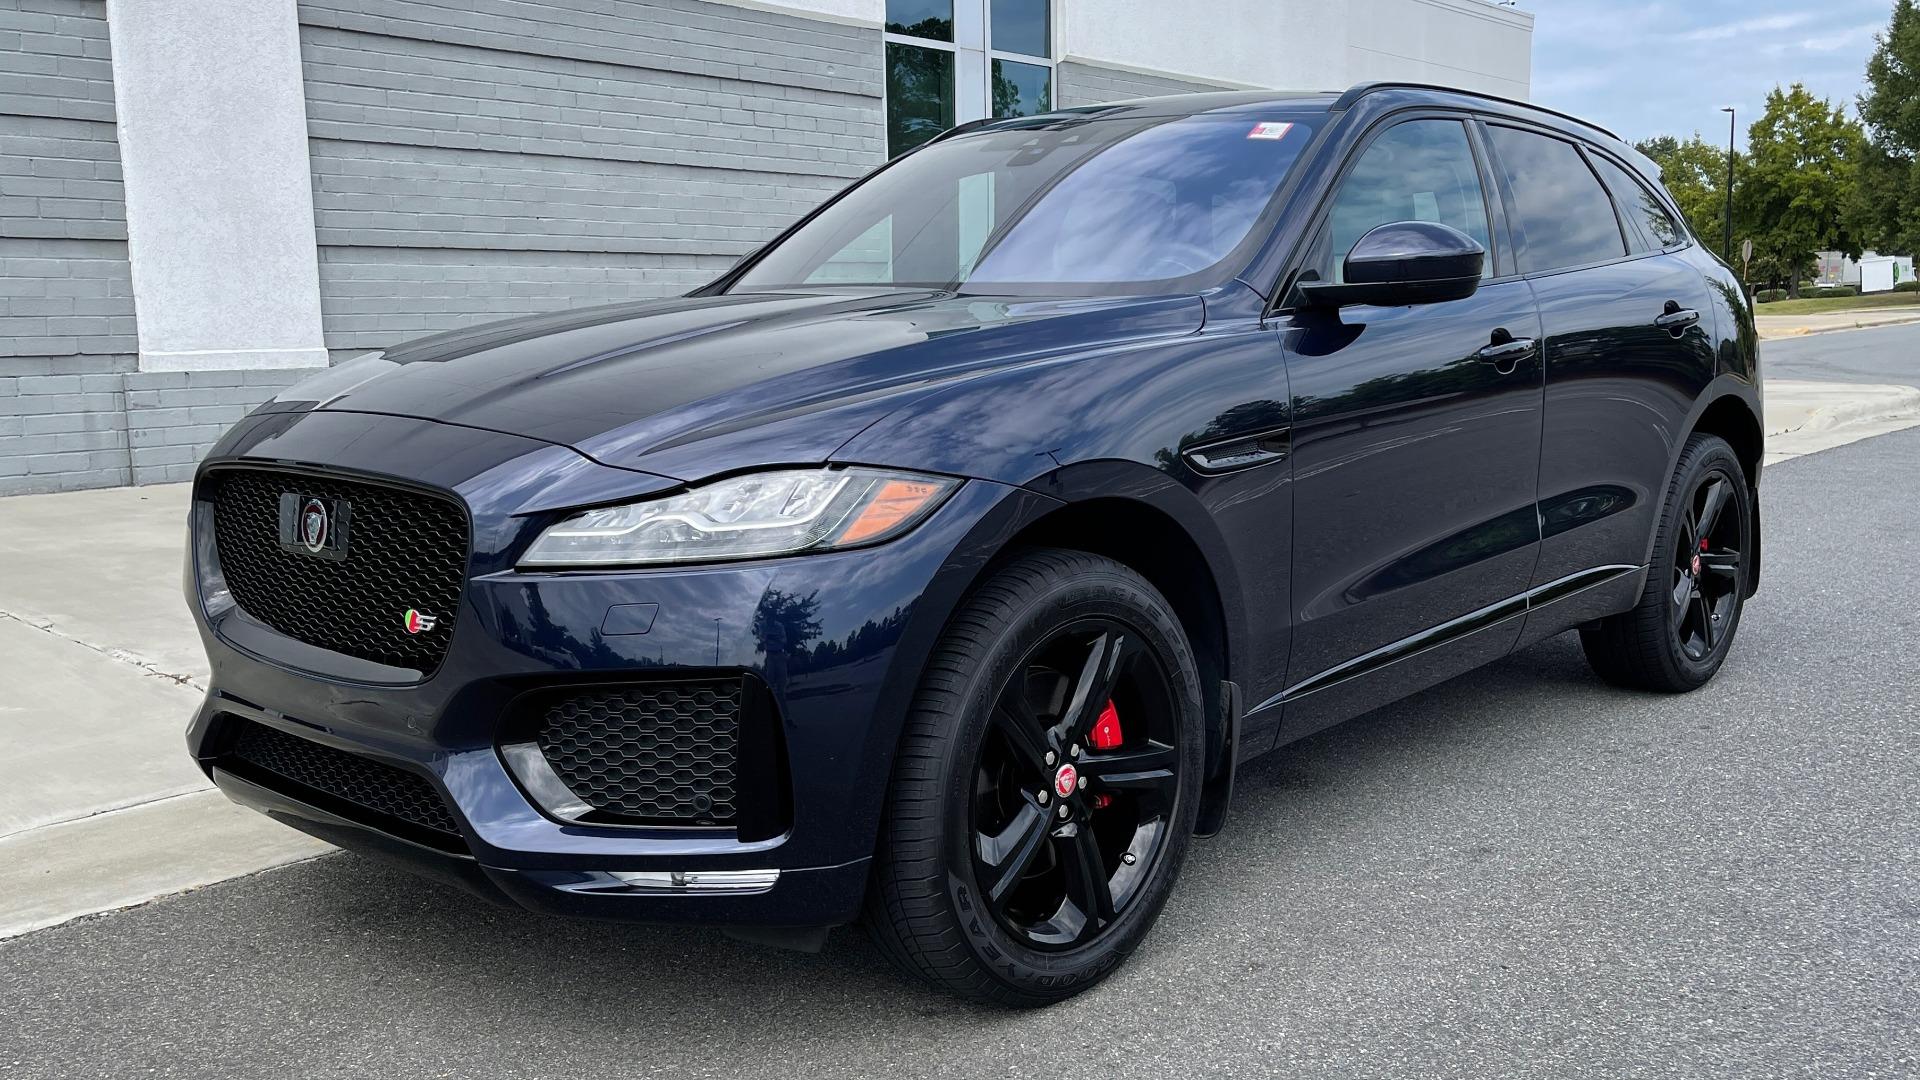 Used 2019 Jaguar F-PACE S / DRIVE PKG / BSA / HUD / BLACK EXT PKG / REARVIEW for sale $50,995 at Formula Imports in Charlotte NC 28227 3